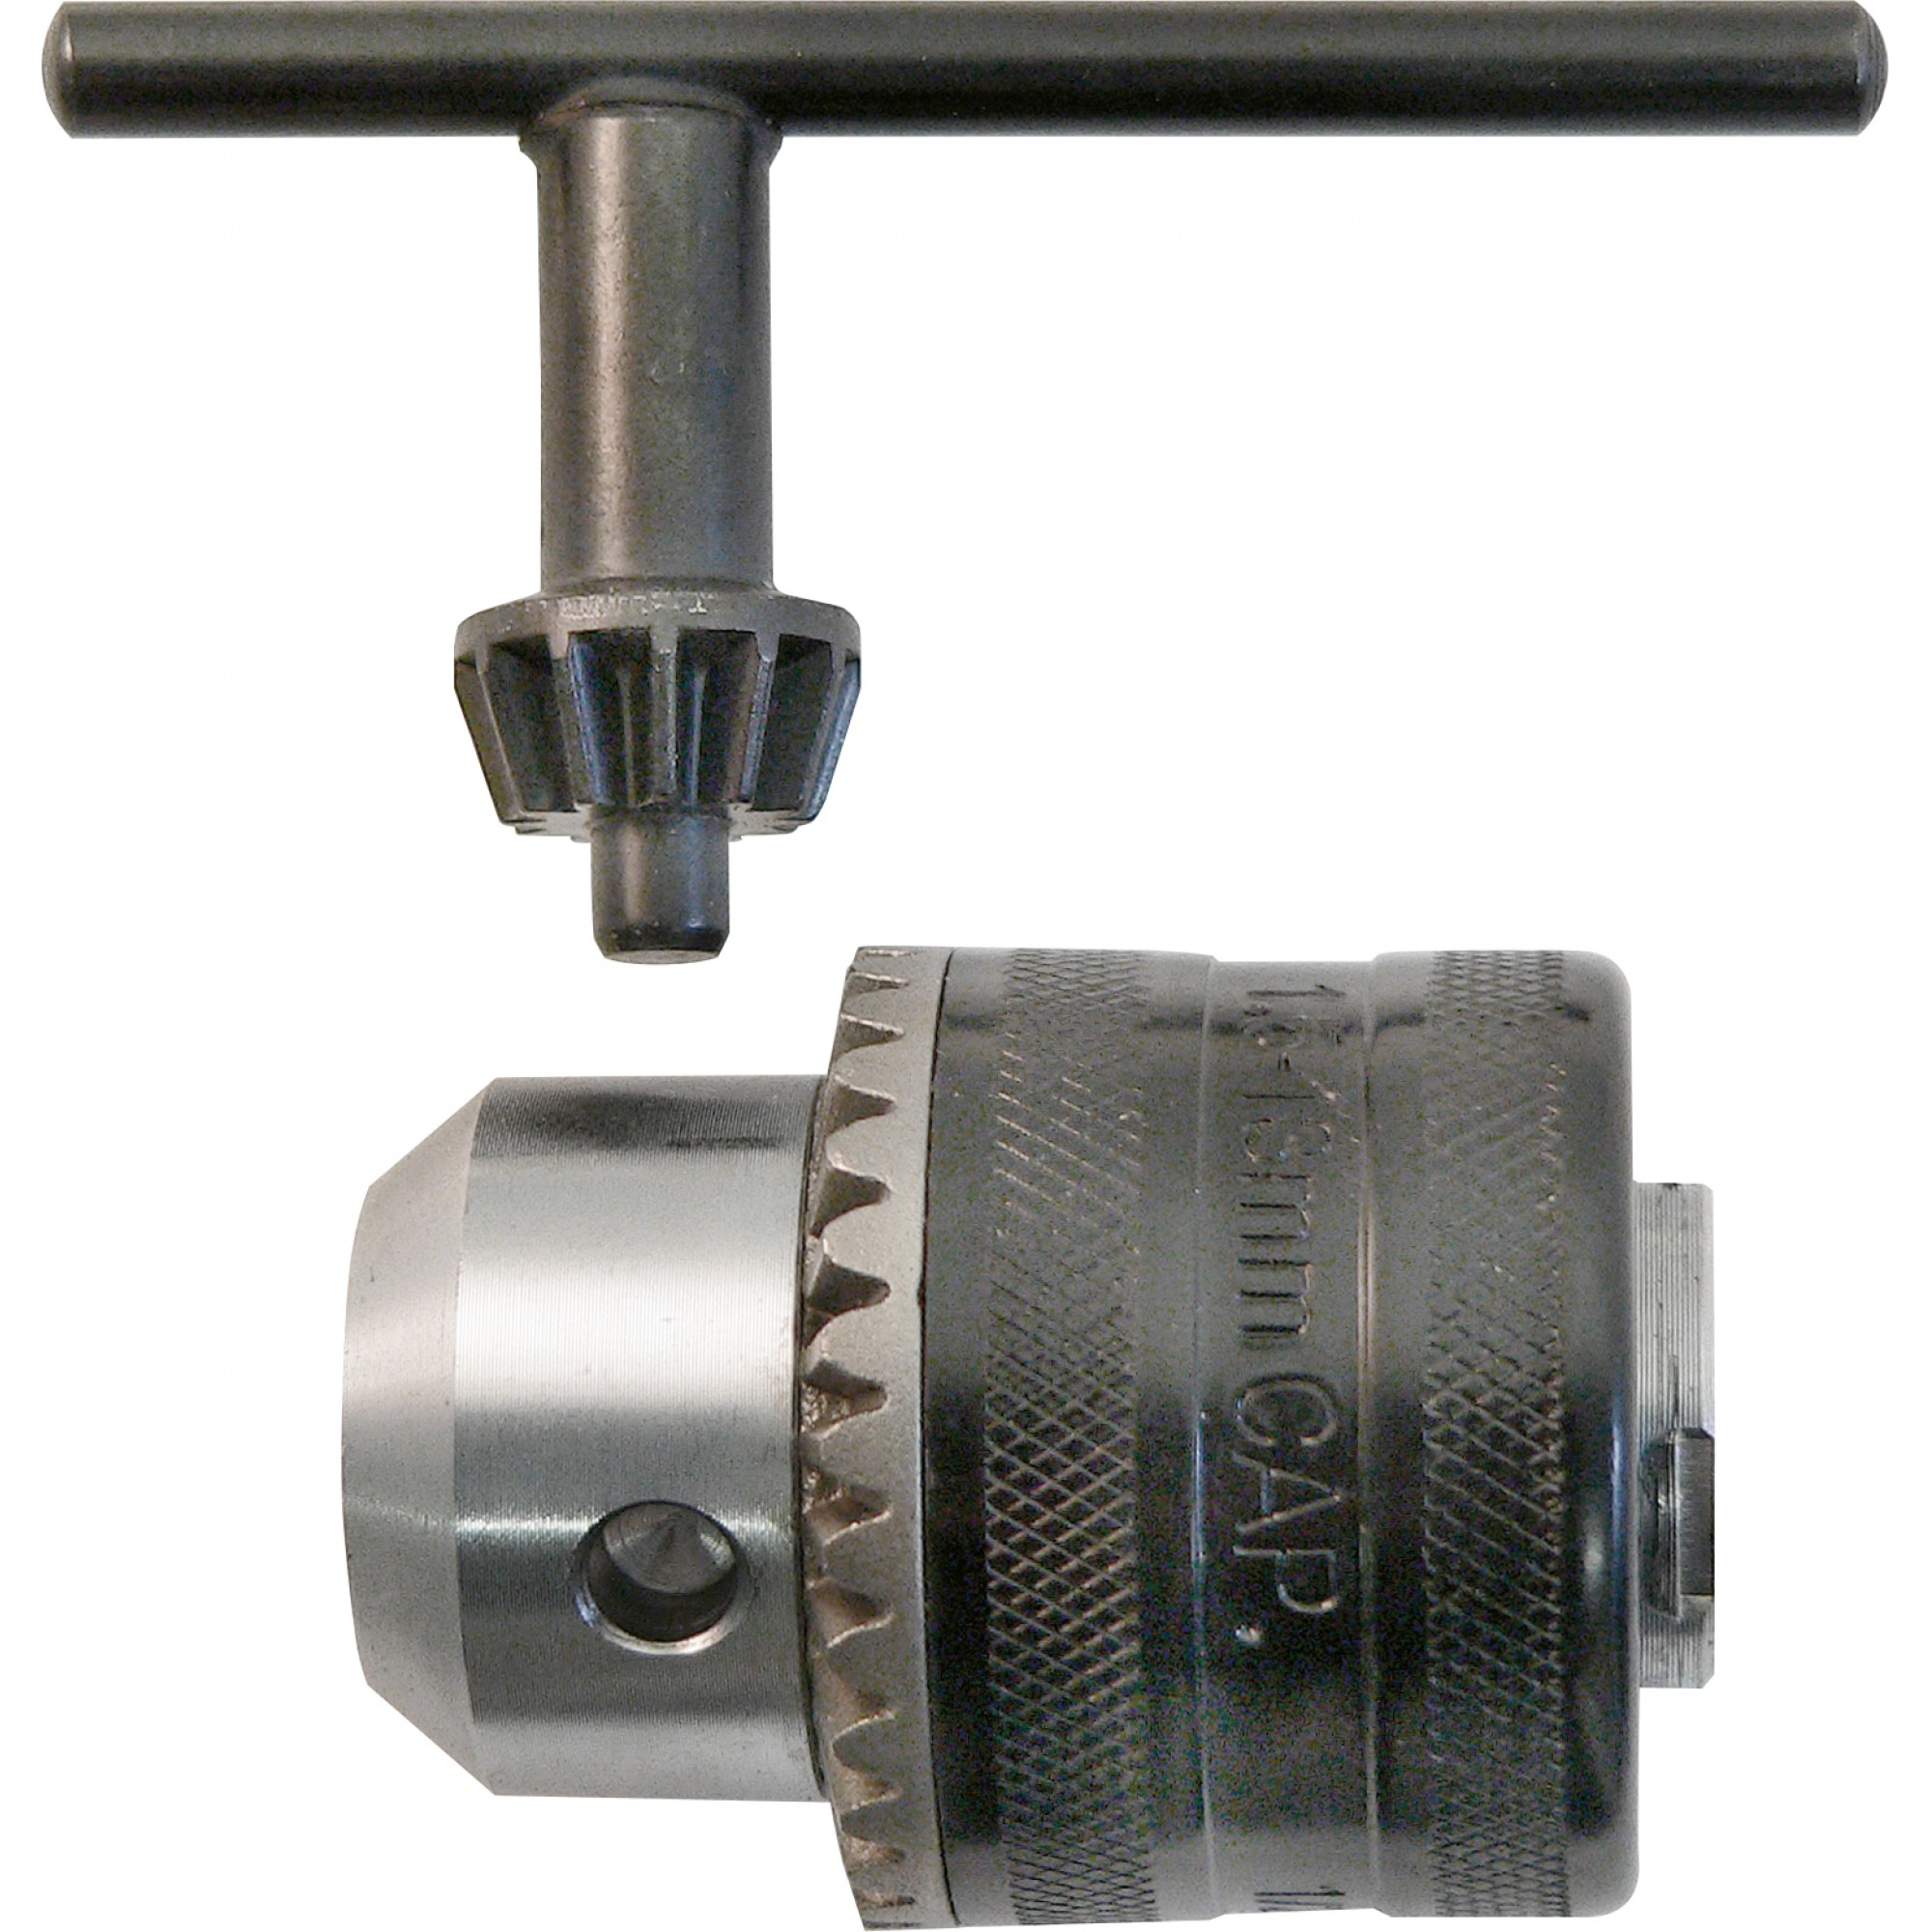 3454 CV Triuso Schalungsbohrer 12 0mm L/änge 400mm